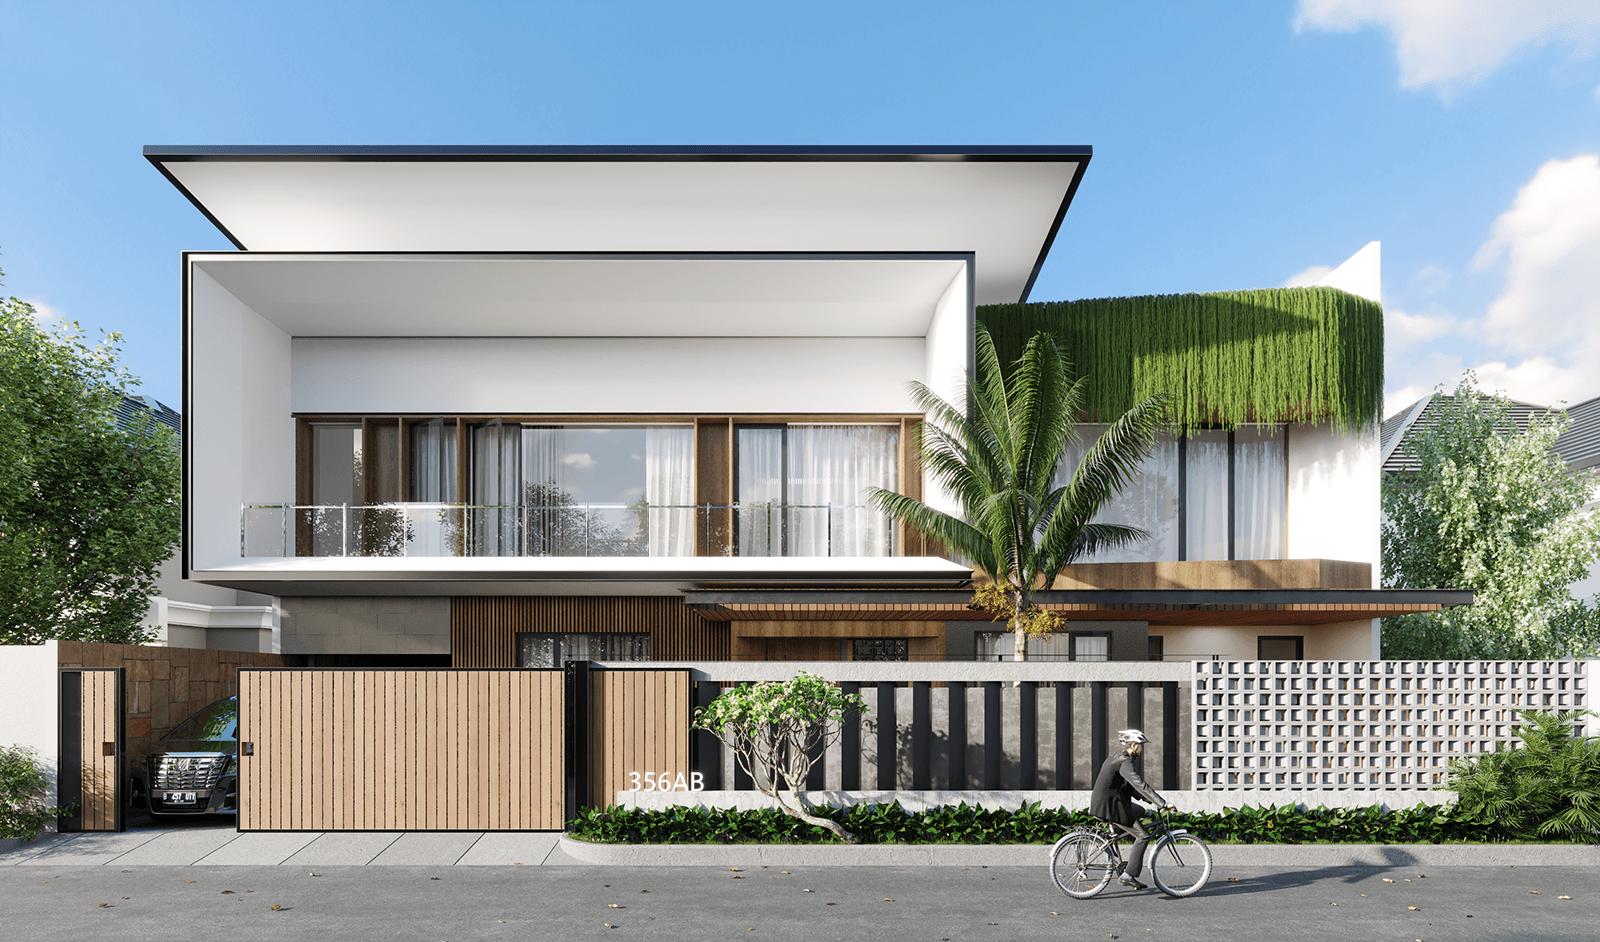 Zwei Architects Indonesia L House Bekasi, Kota Bks, Jawa Barat, Indonesia Bekasi, Kota Bks, Jawa Barat, Indonesia Zwei-Architects-Indonesia-L-House  110300